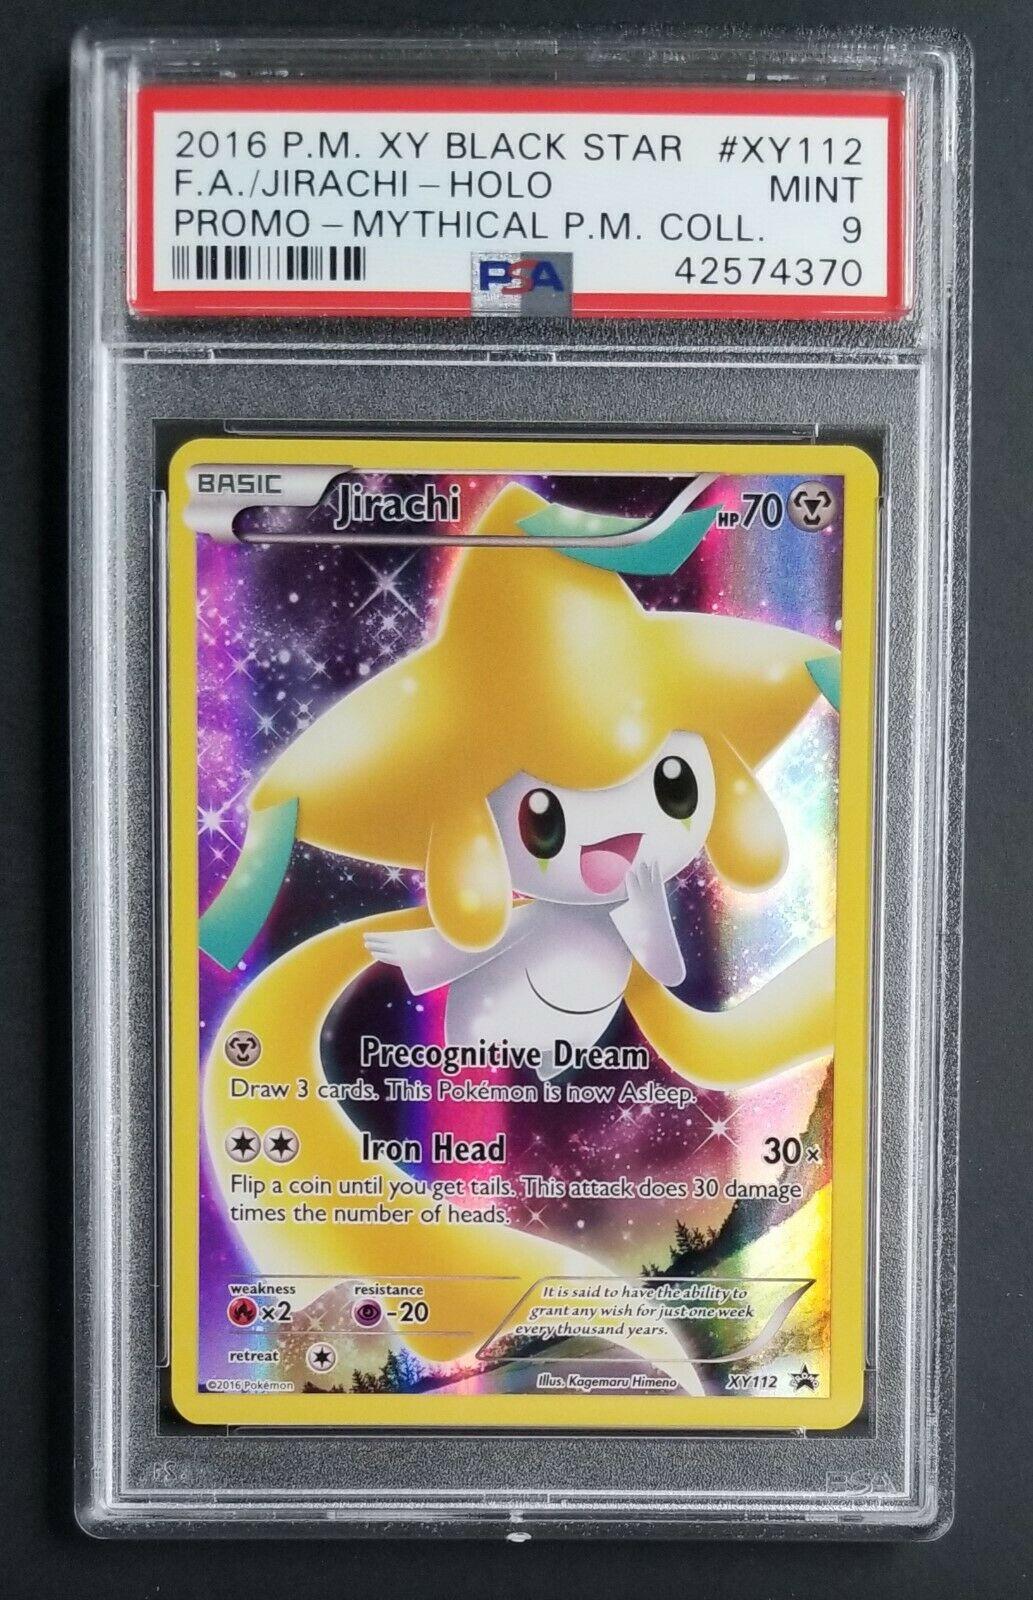 Jirachi Full Art Holo Pokemon Card Black Star Generations XY Promo XY112